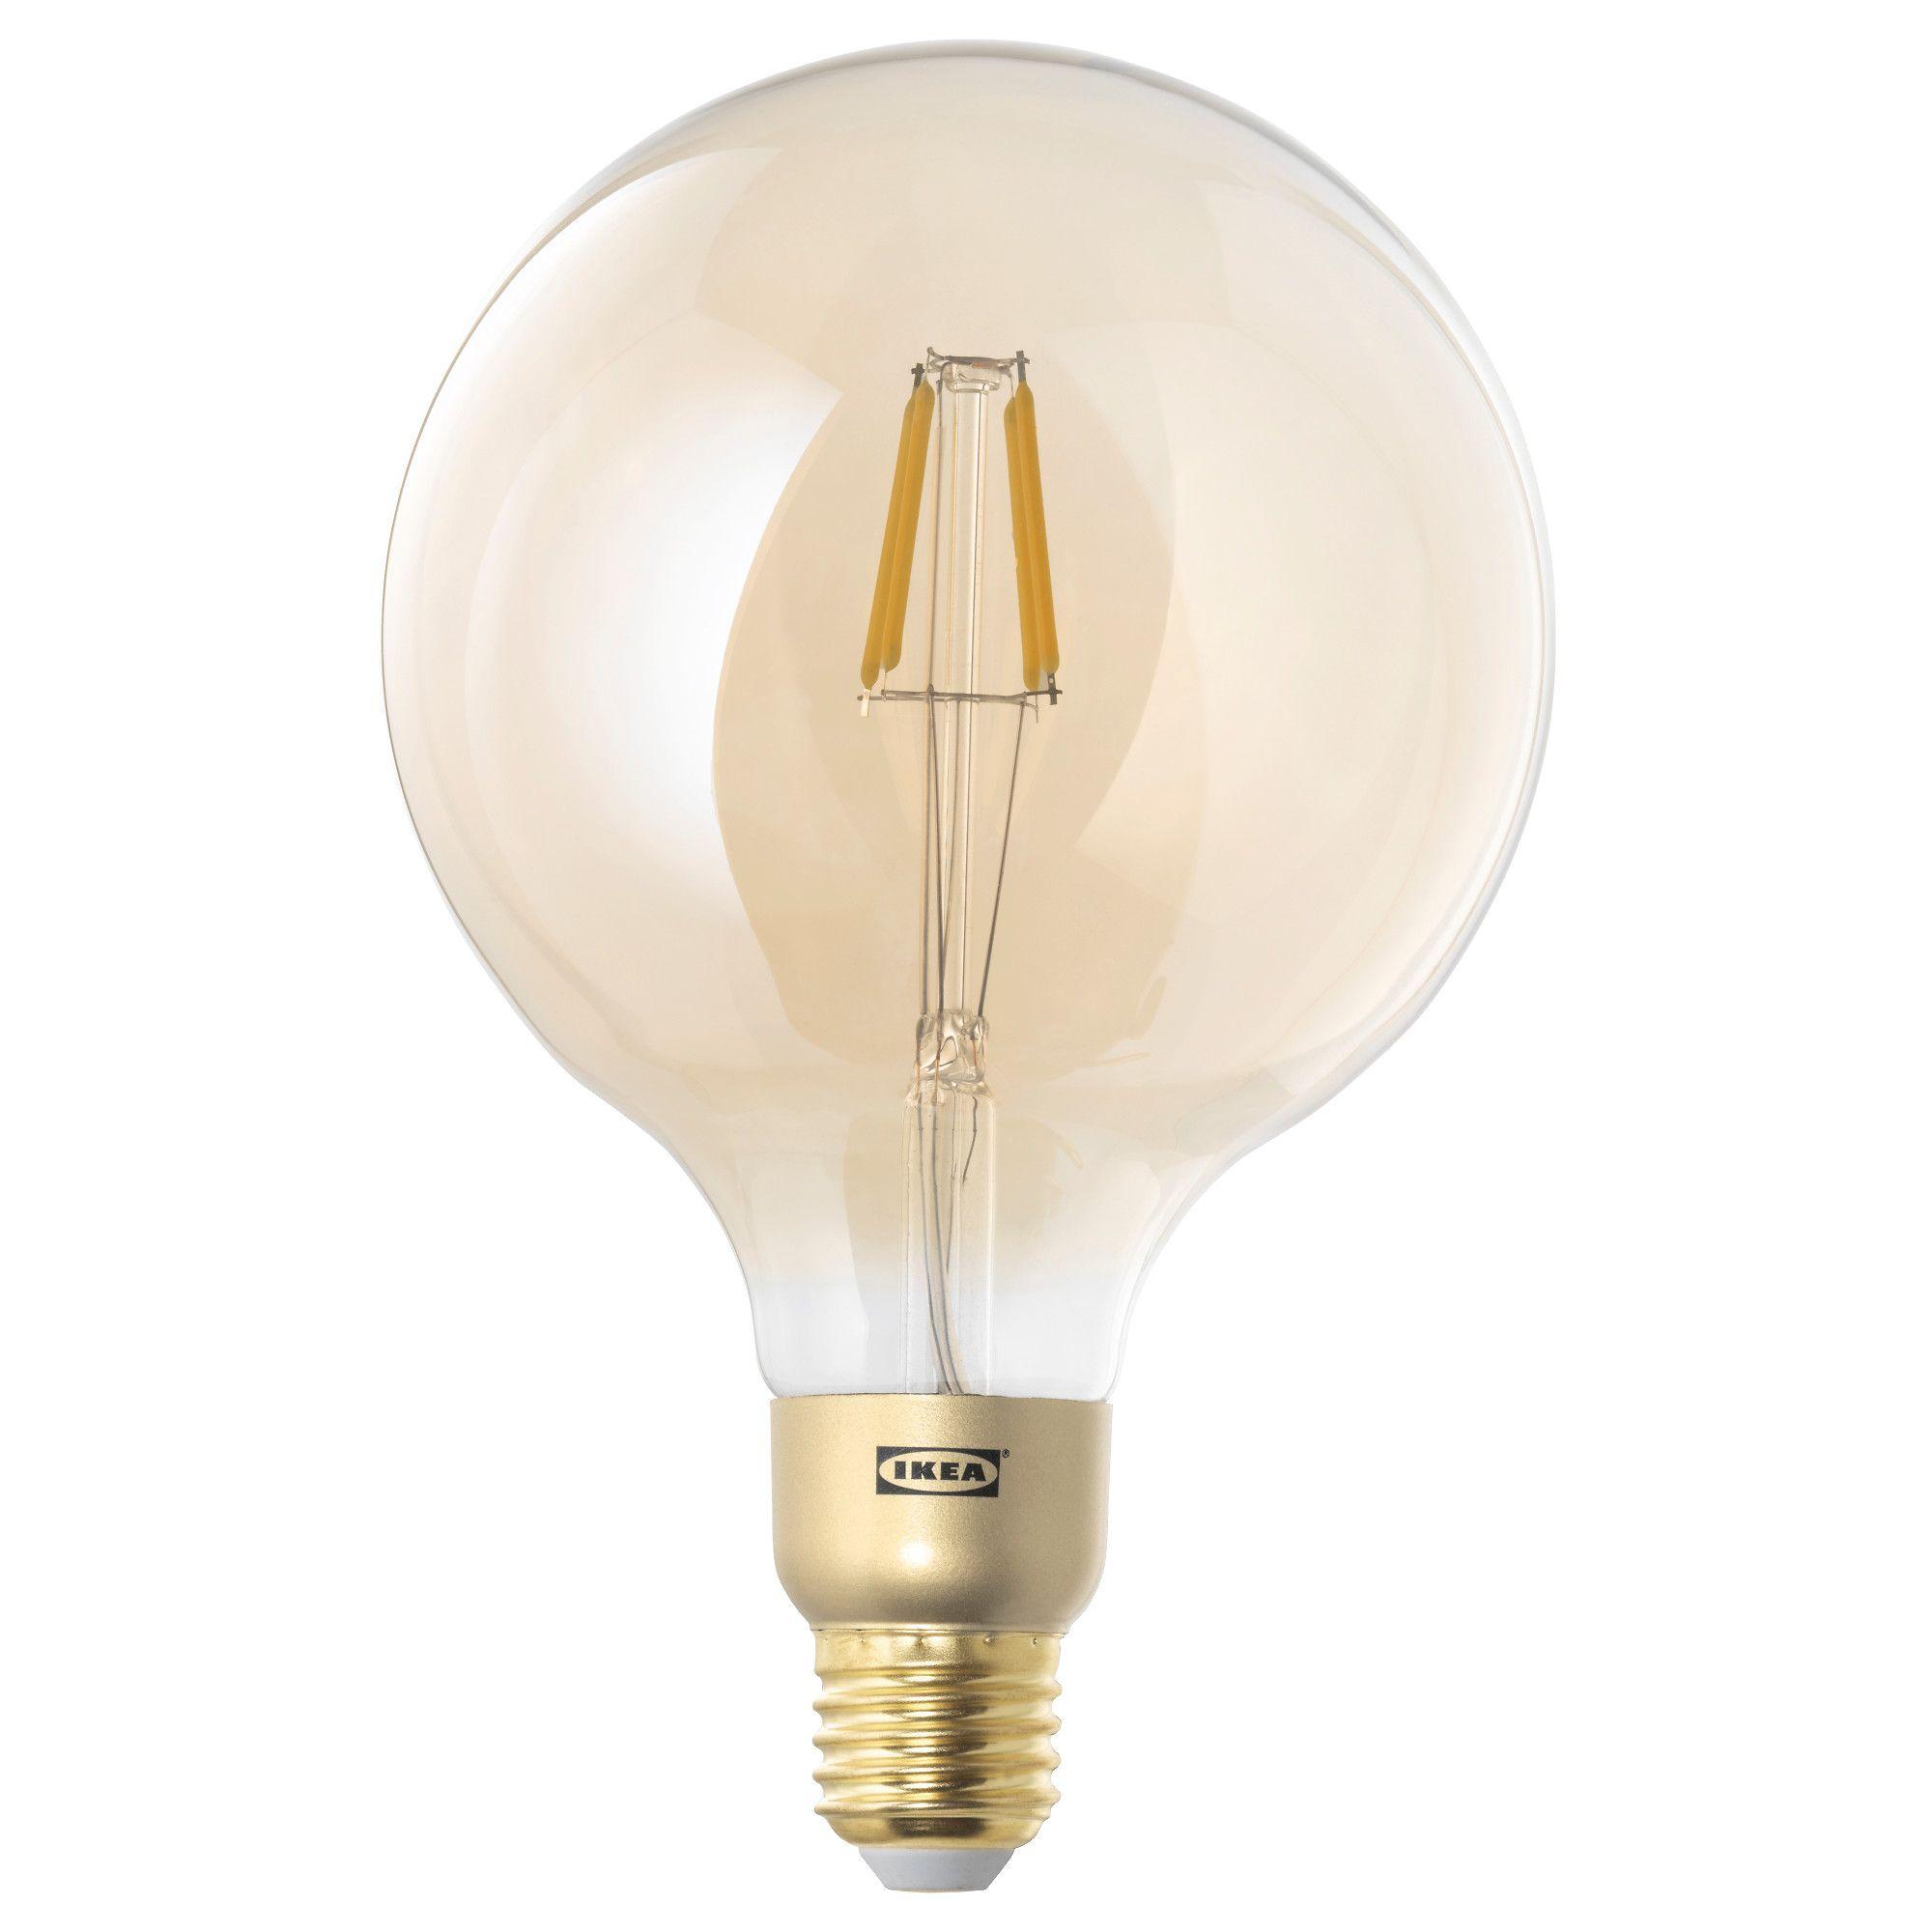 LUNNOM LED ljuskälla E27 400 lumen, dimbar, globformad brun klarglas ...